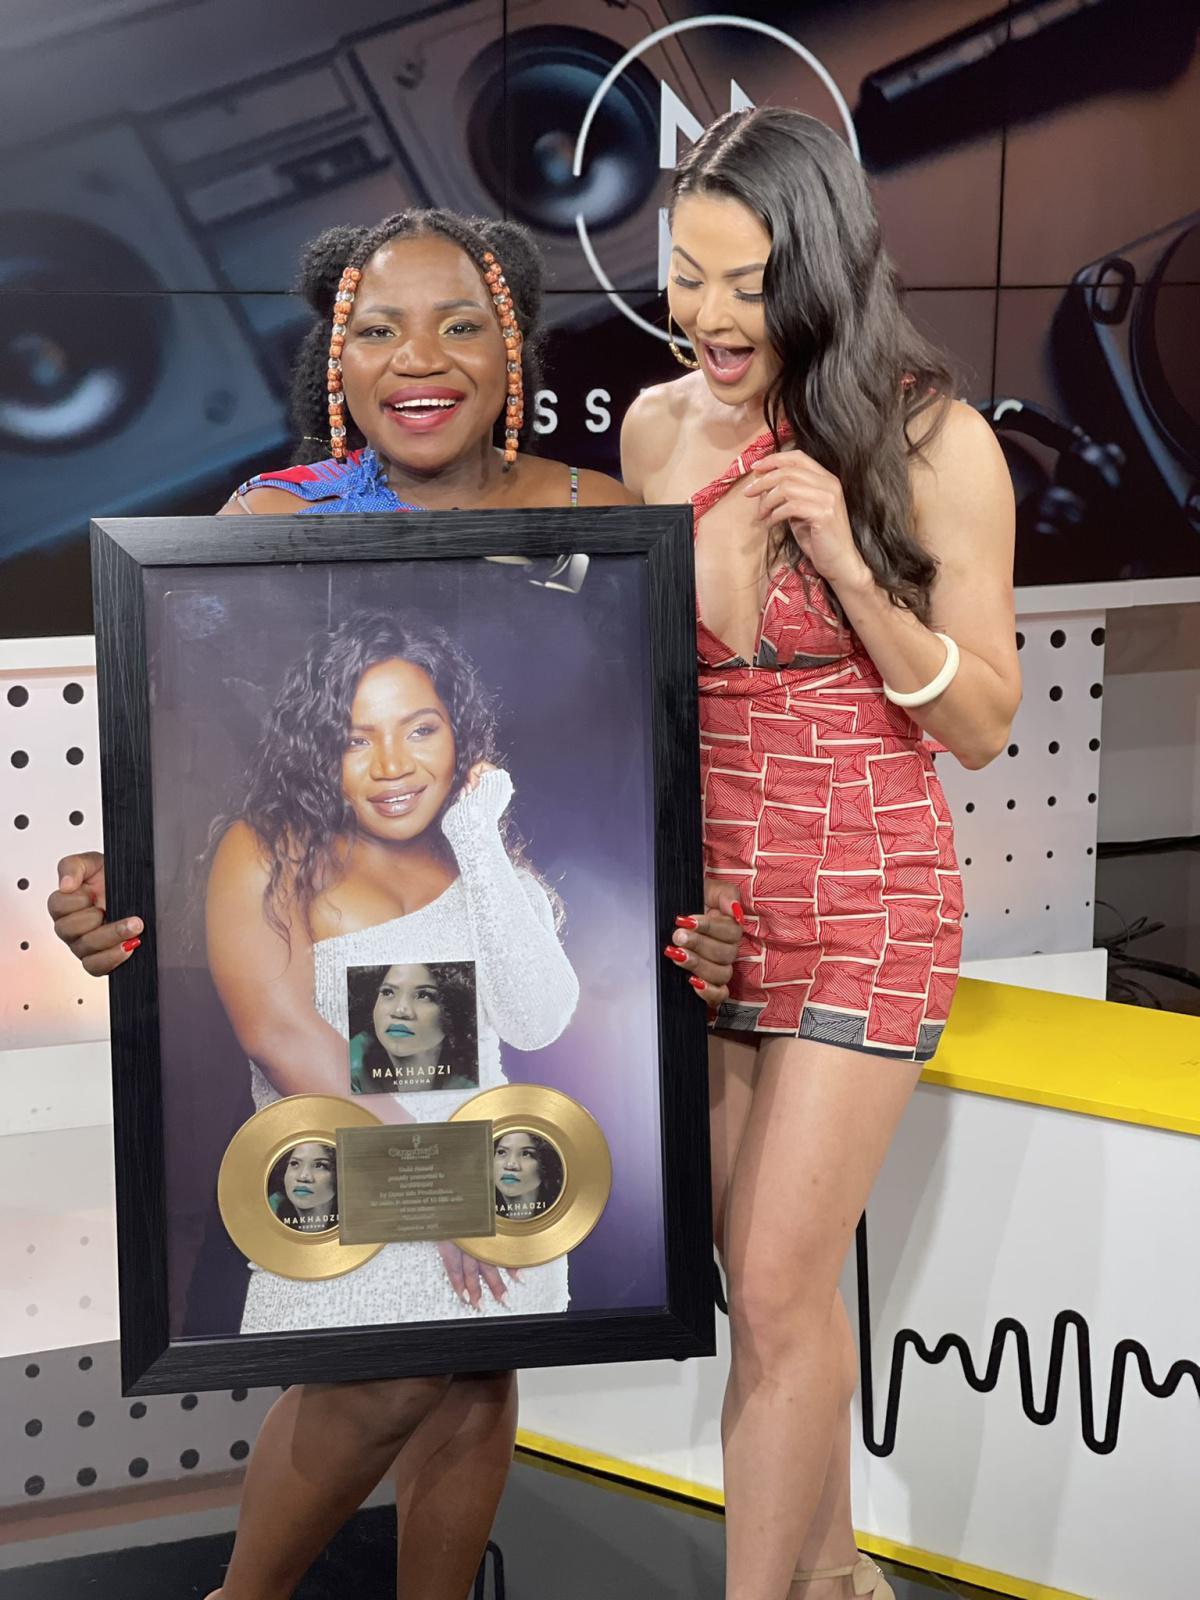 Makhadzi album, 'Kokovha' has reached Gold status